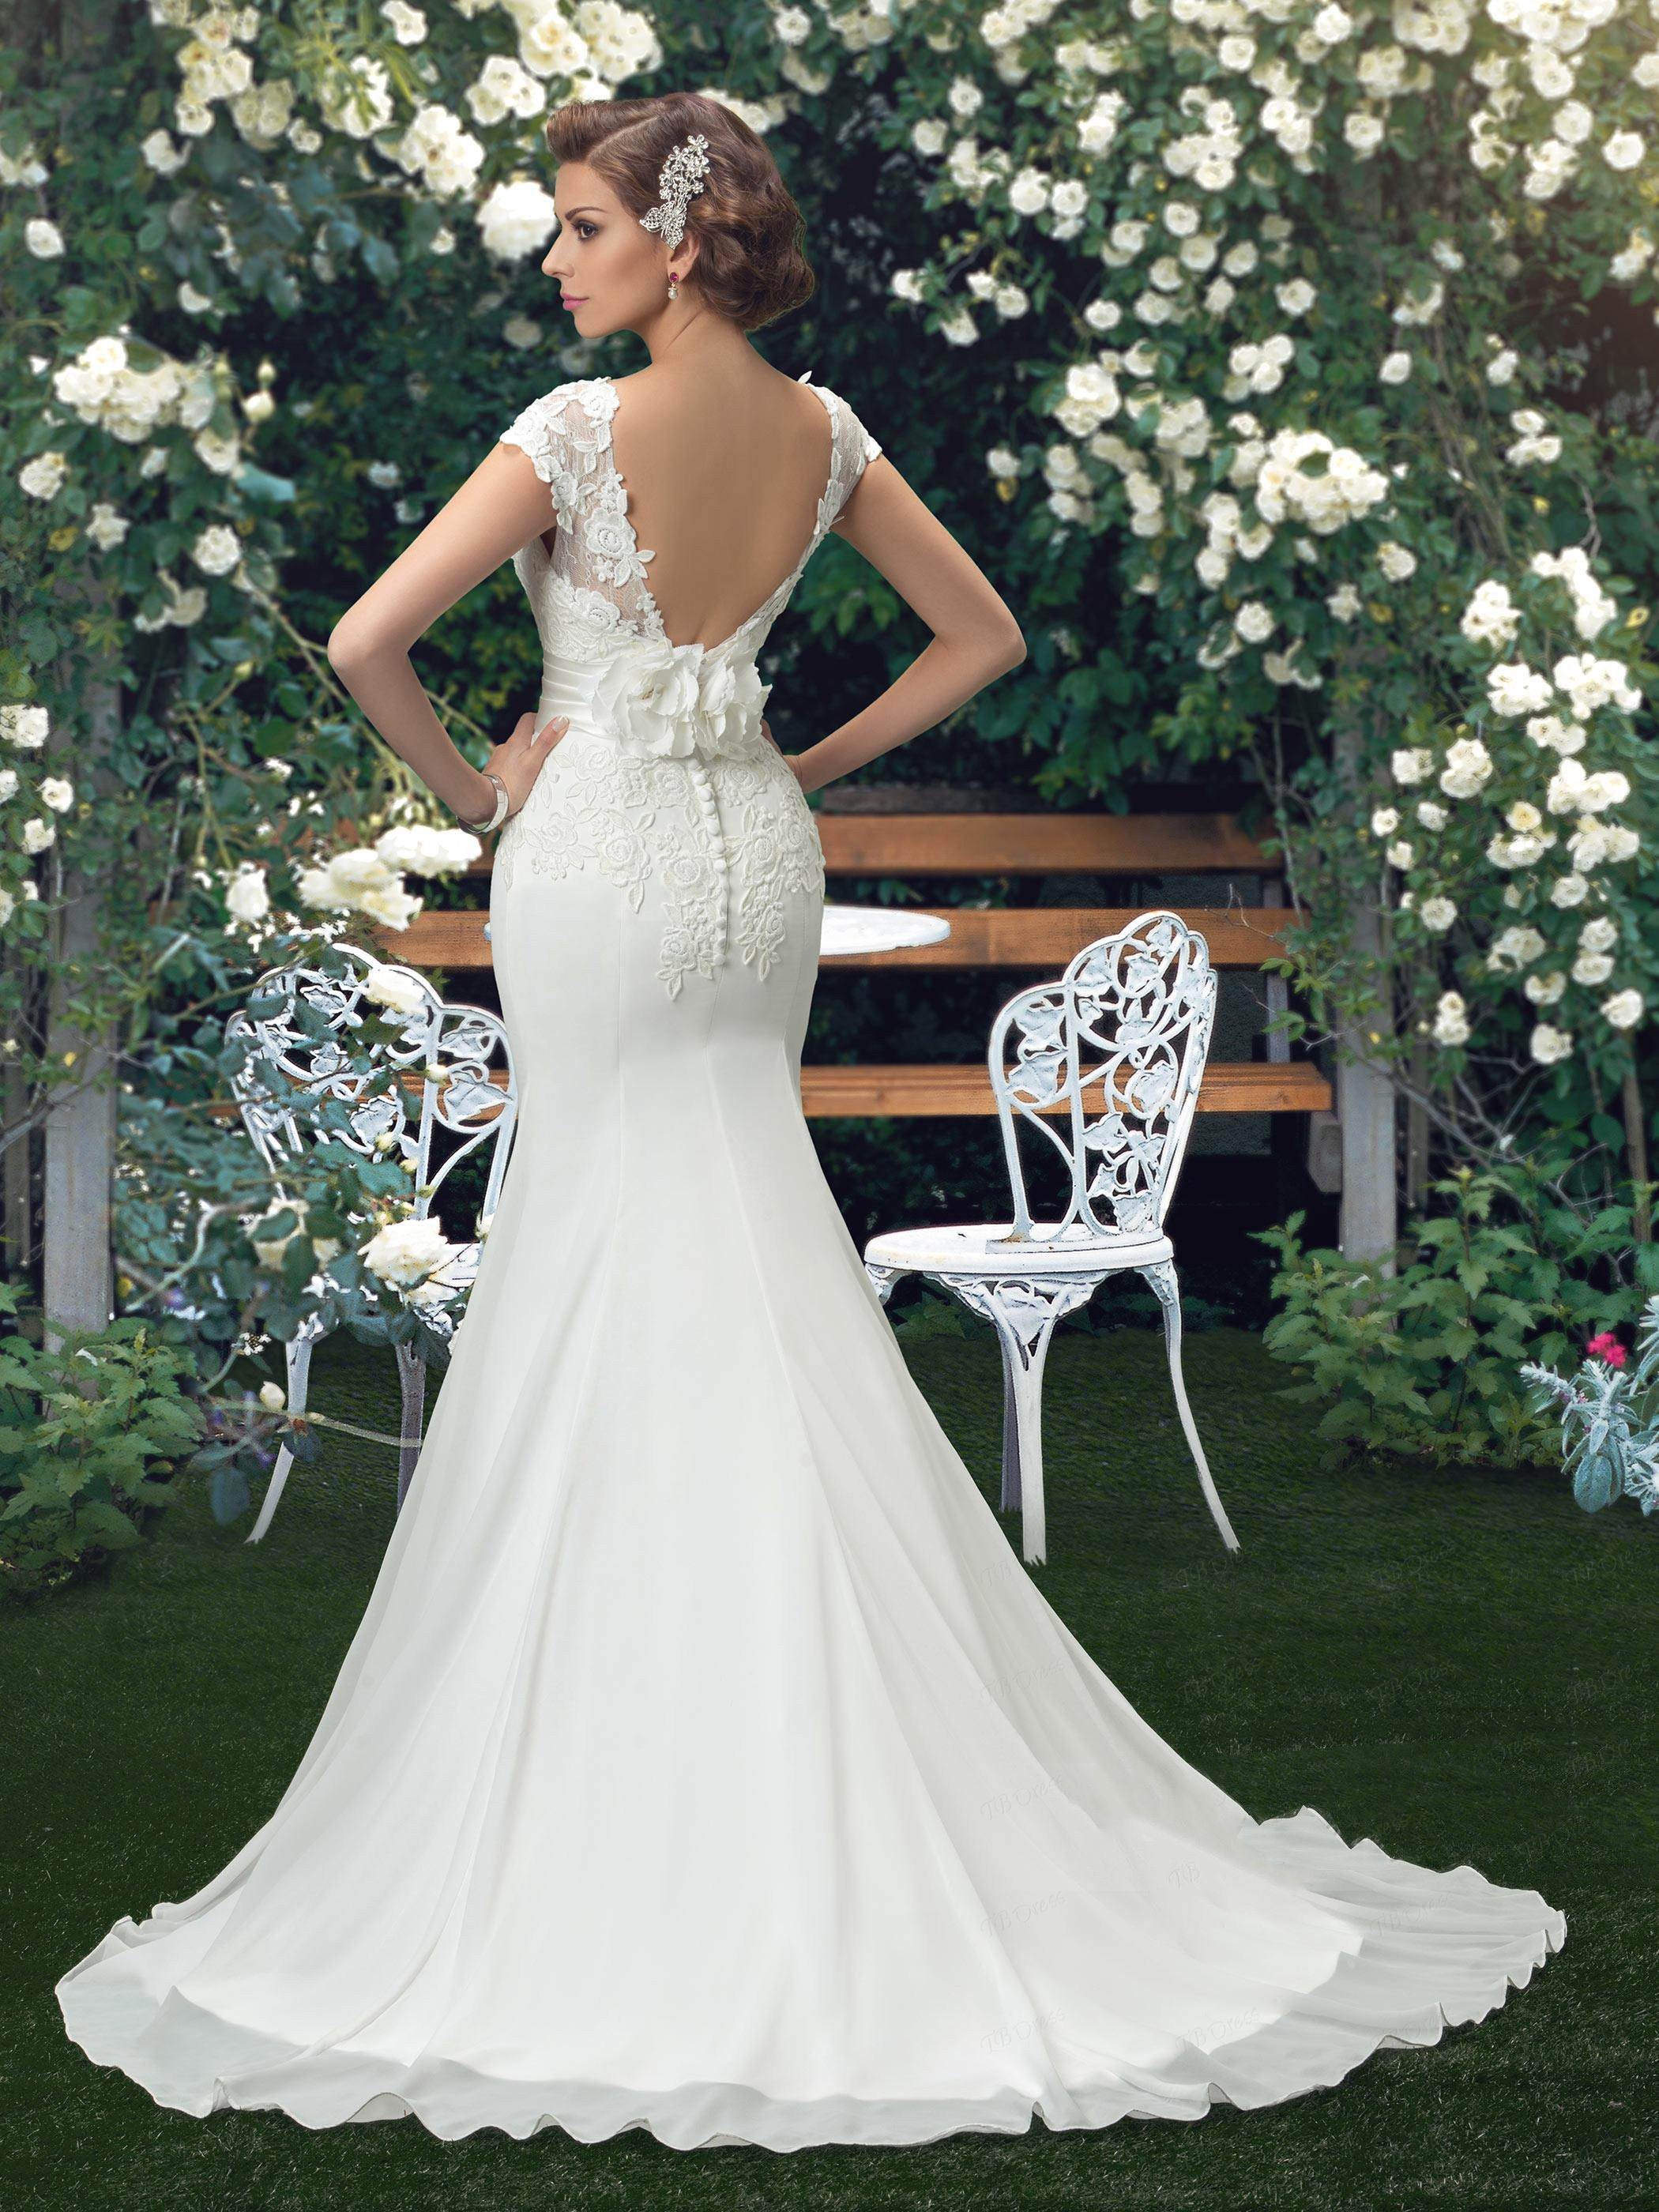 33 Imágenes de Vestidos de Novia bonitos e impresionantes